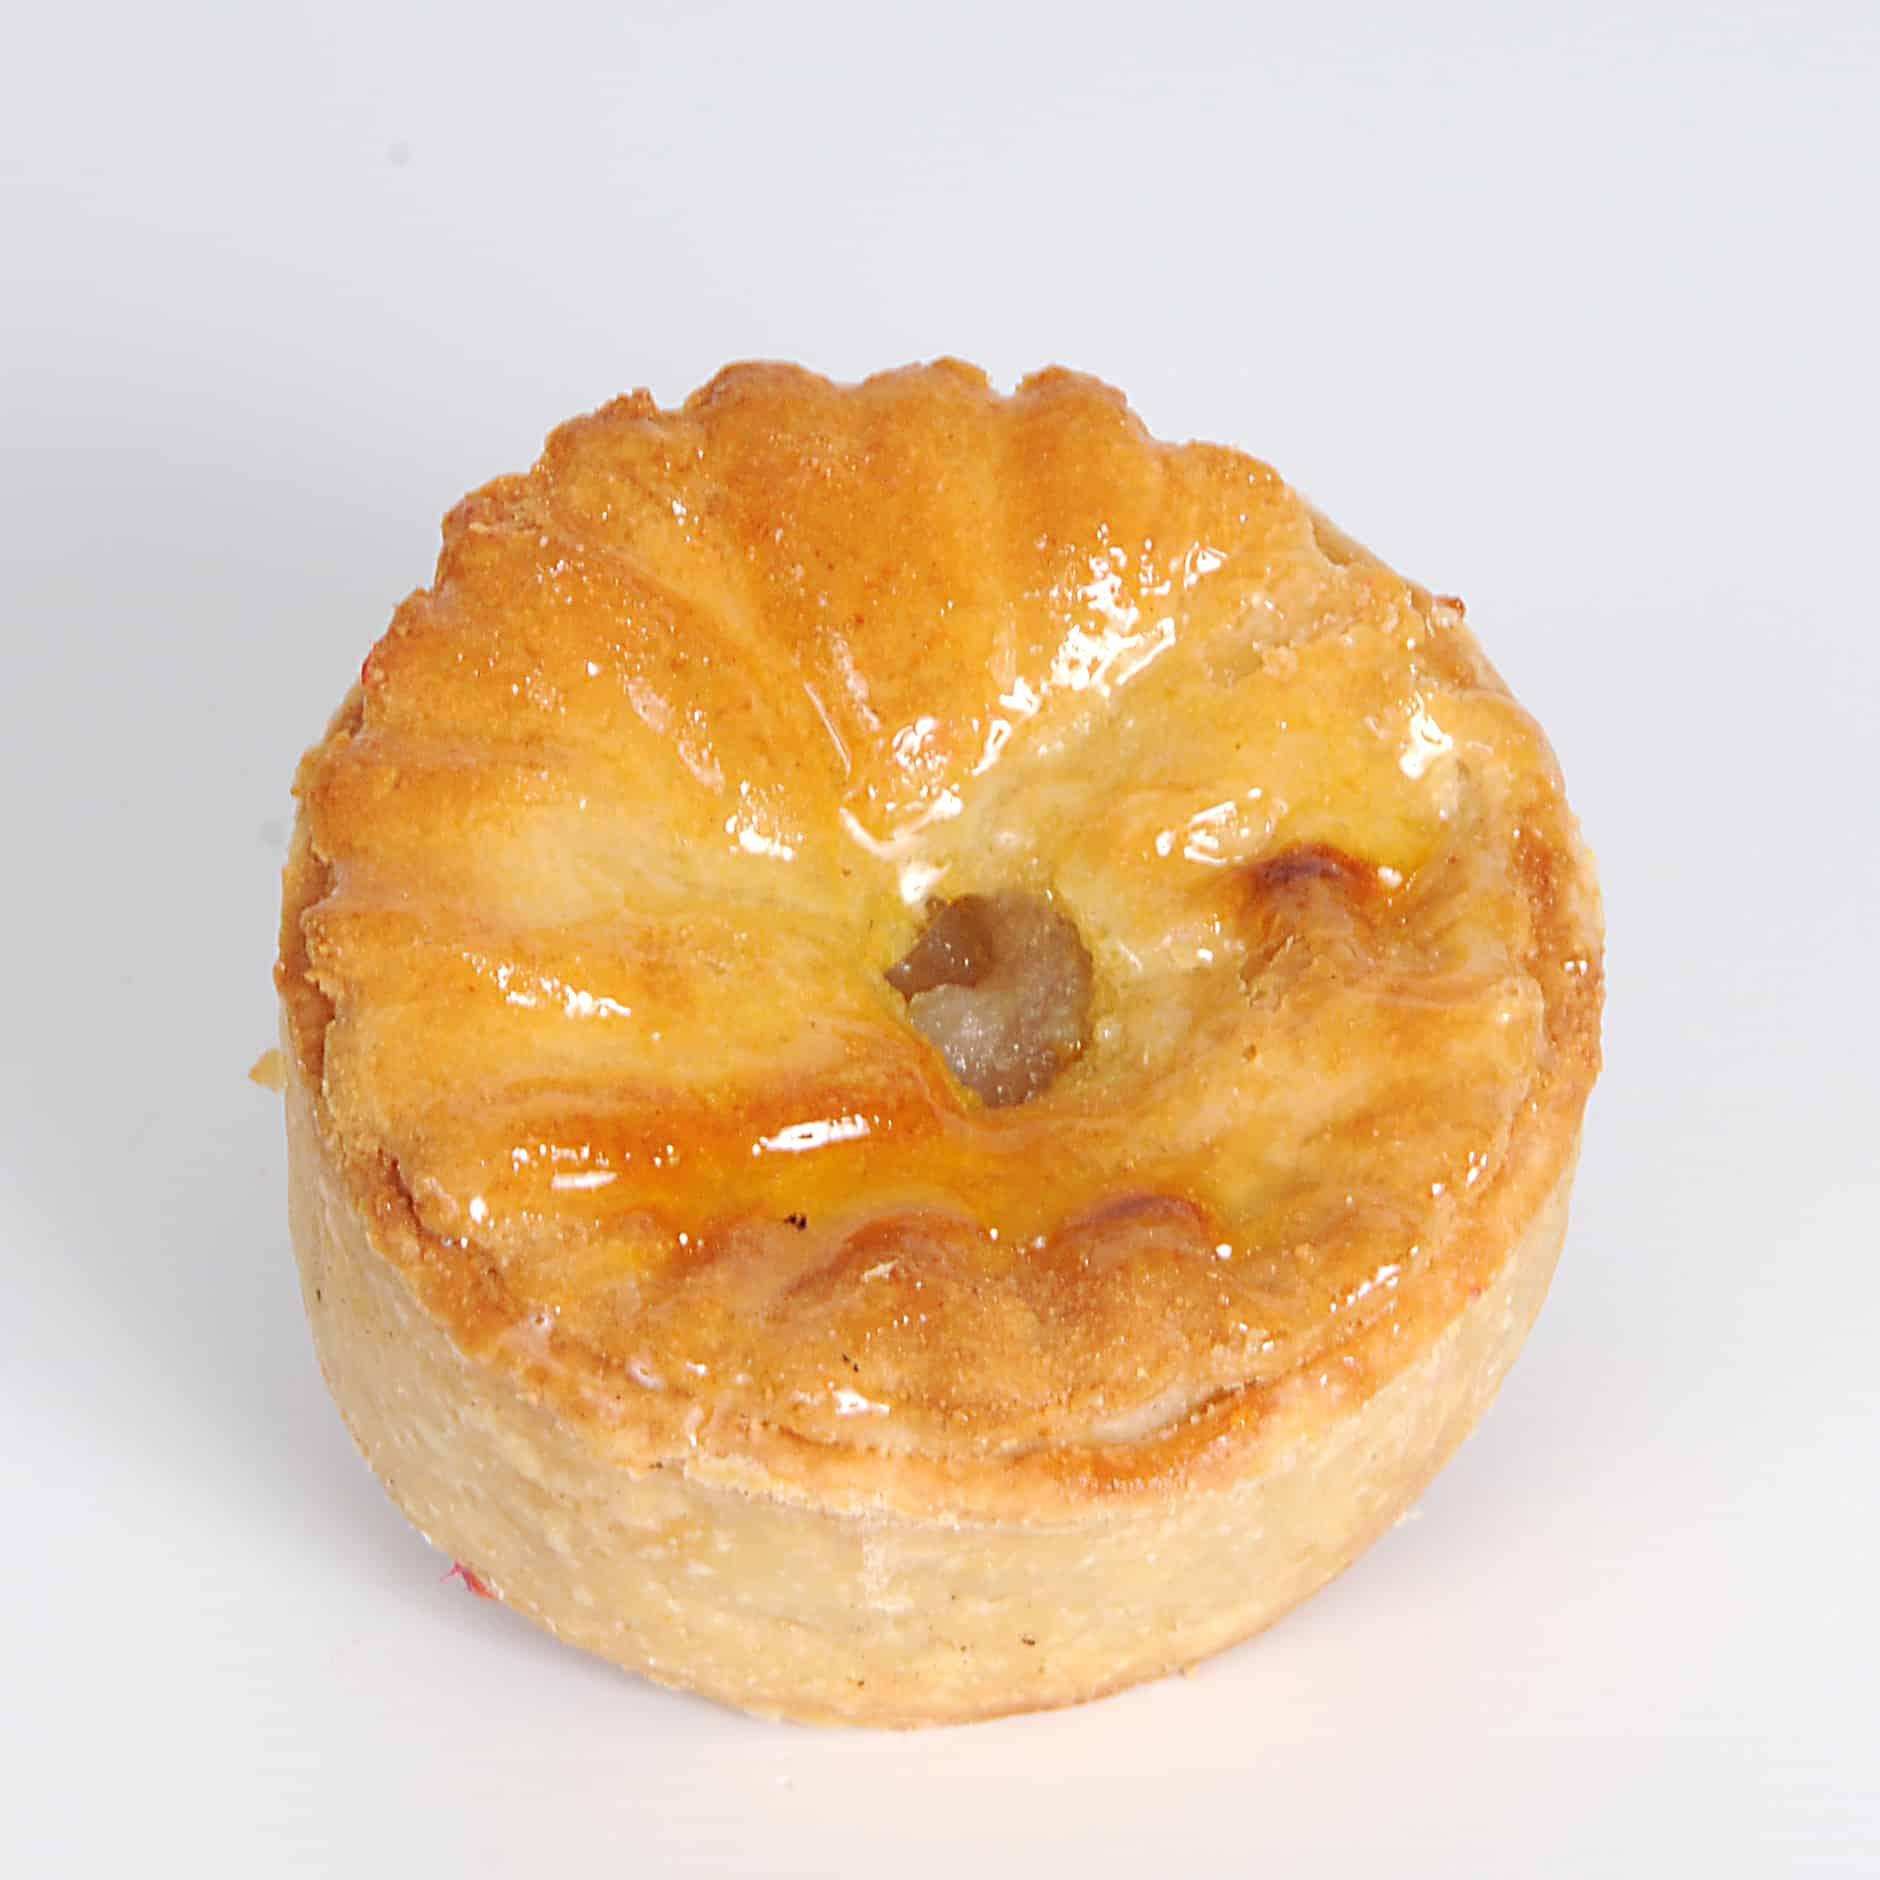 Apple Pies - Stuart's the Bakers